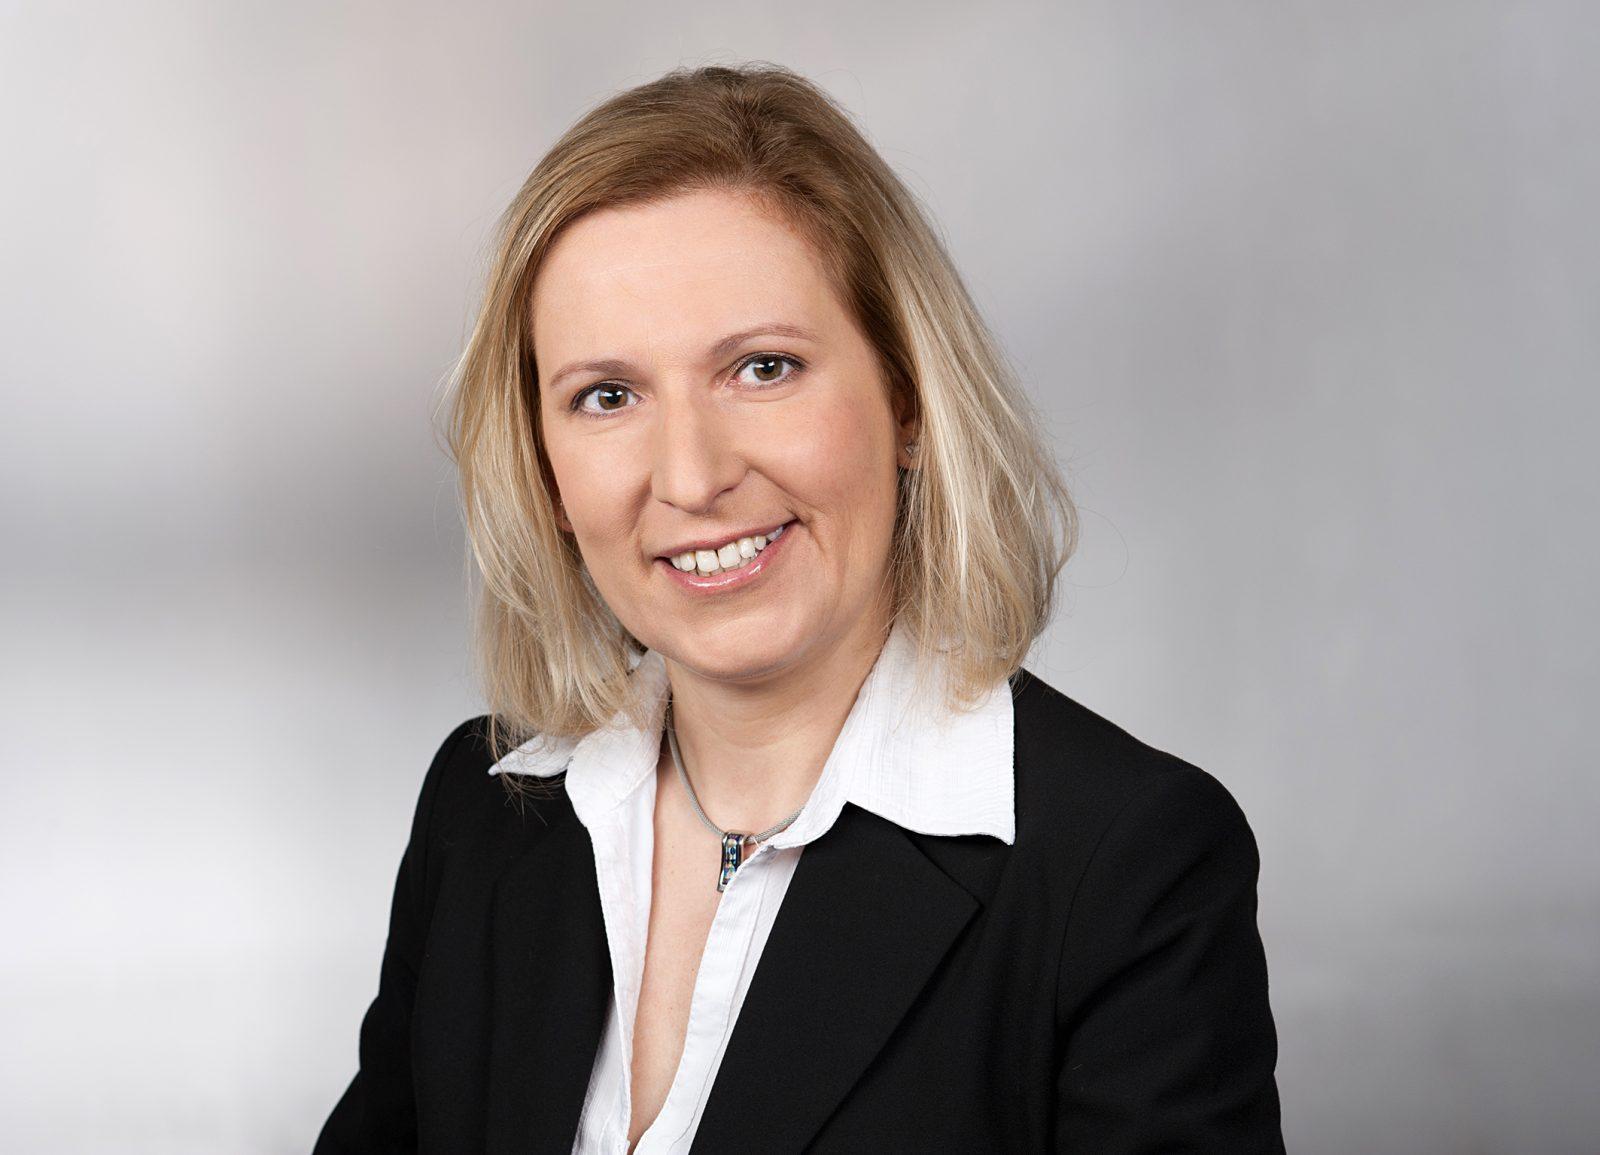 Barbara Billinger